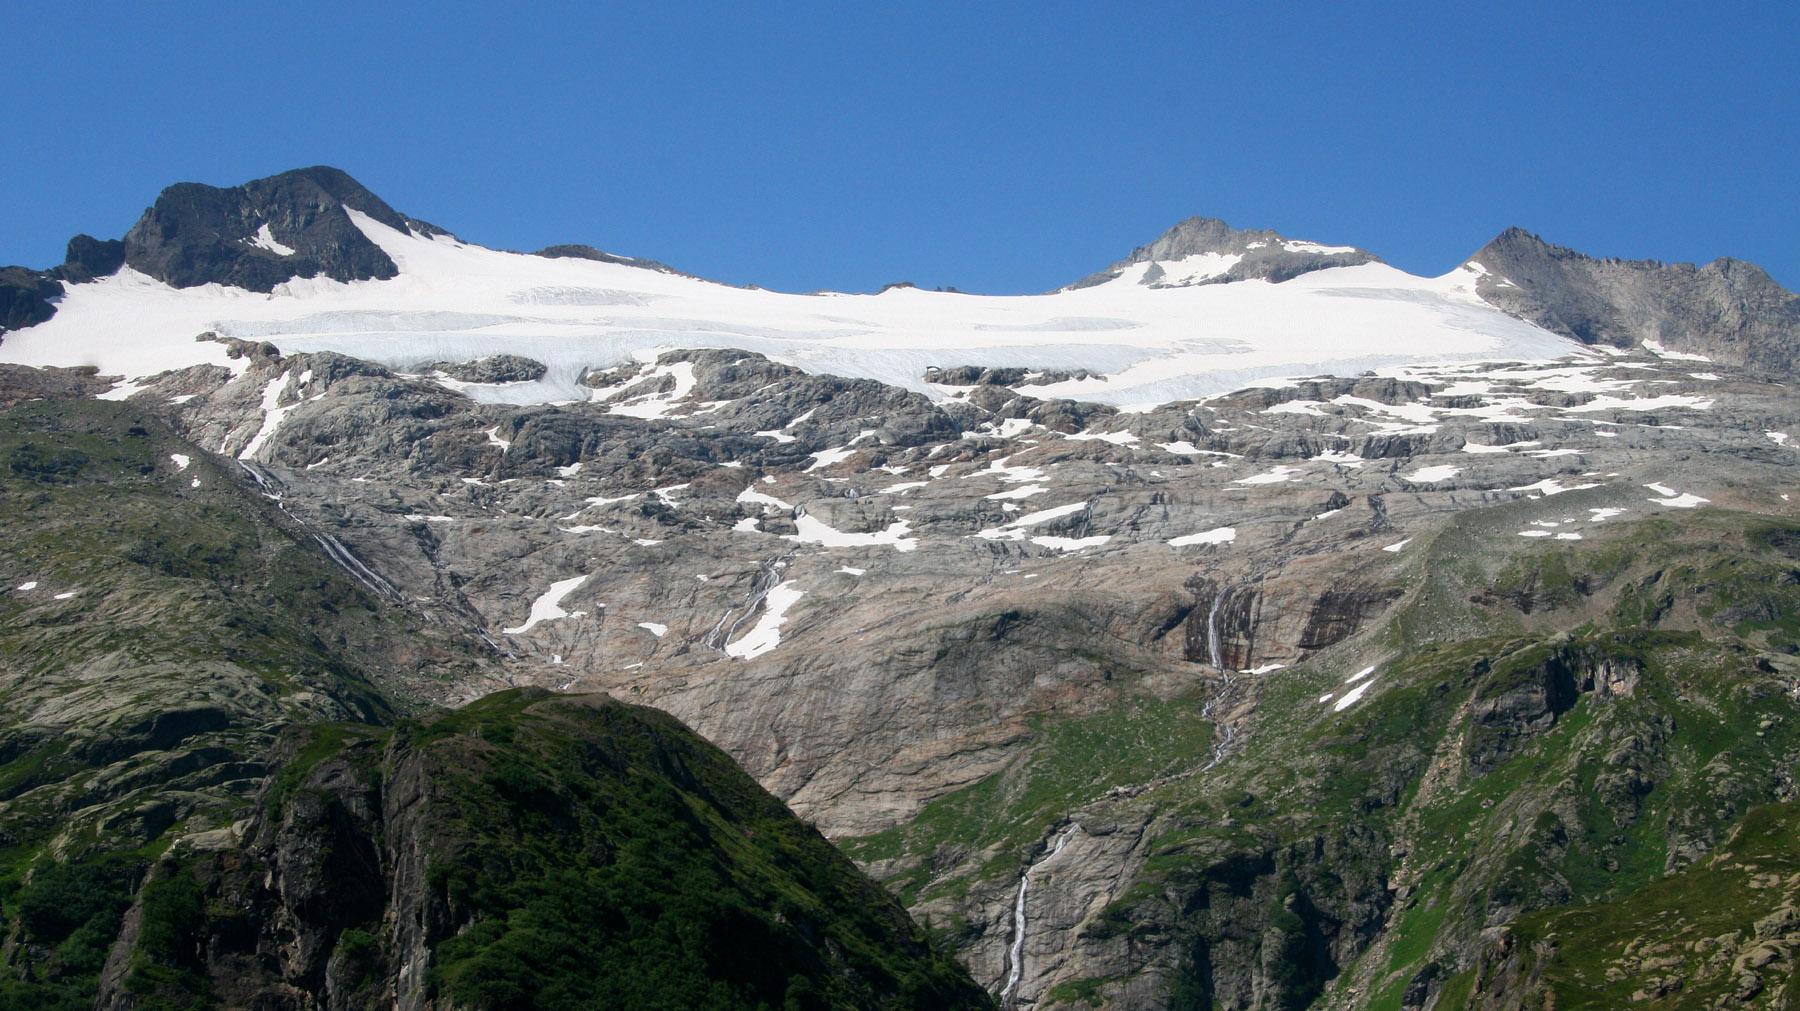 Basodinò 3273 m mit Gletscher